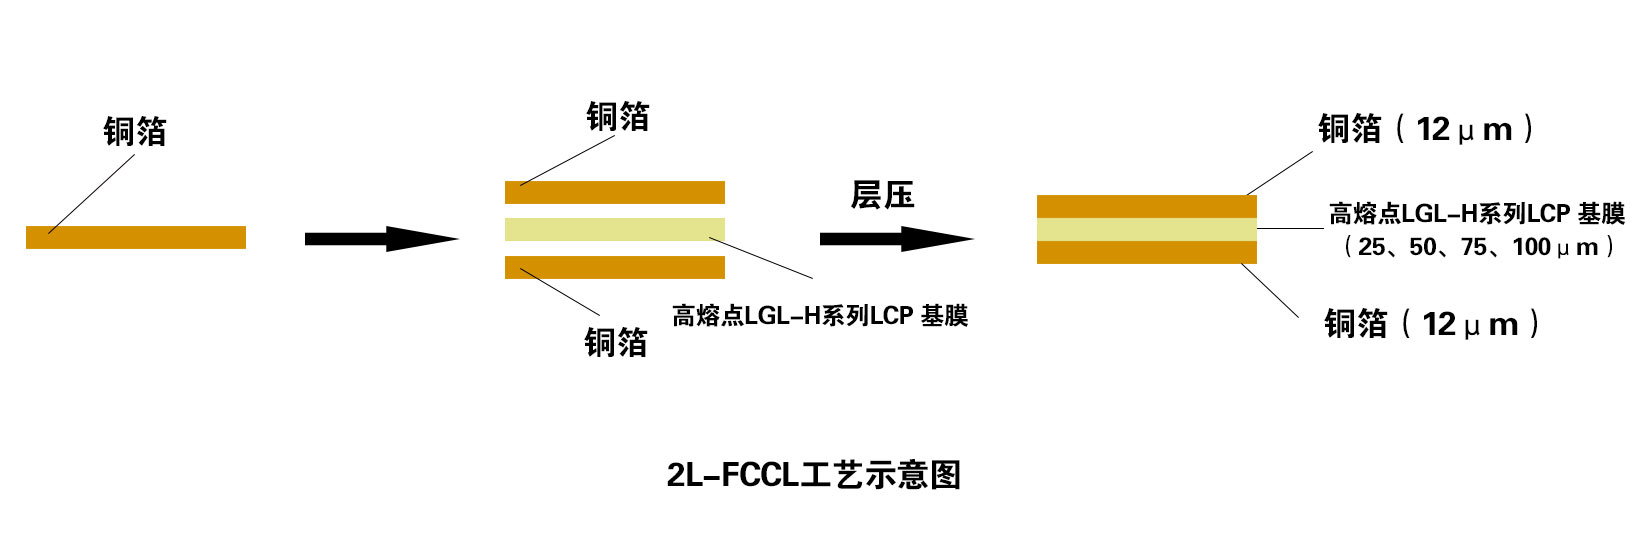 2L-FCCL工藝示意圖